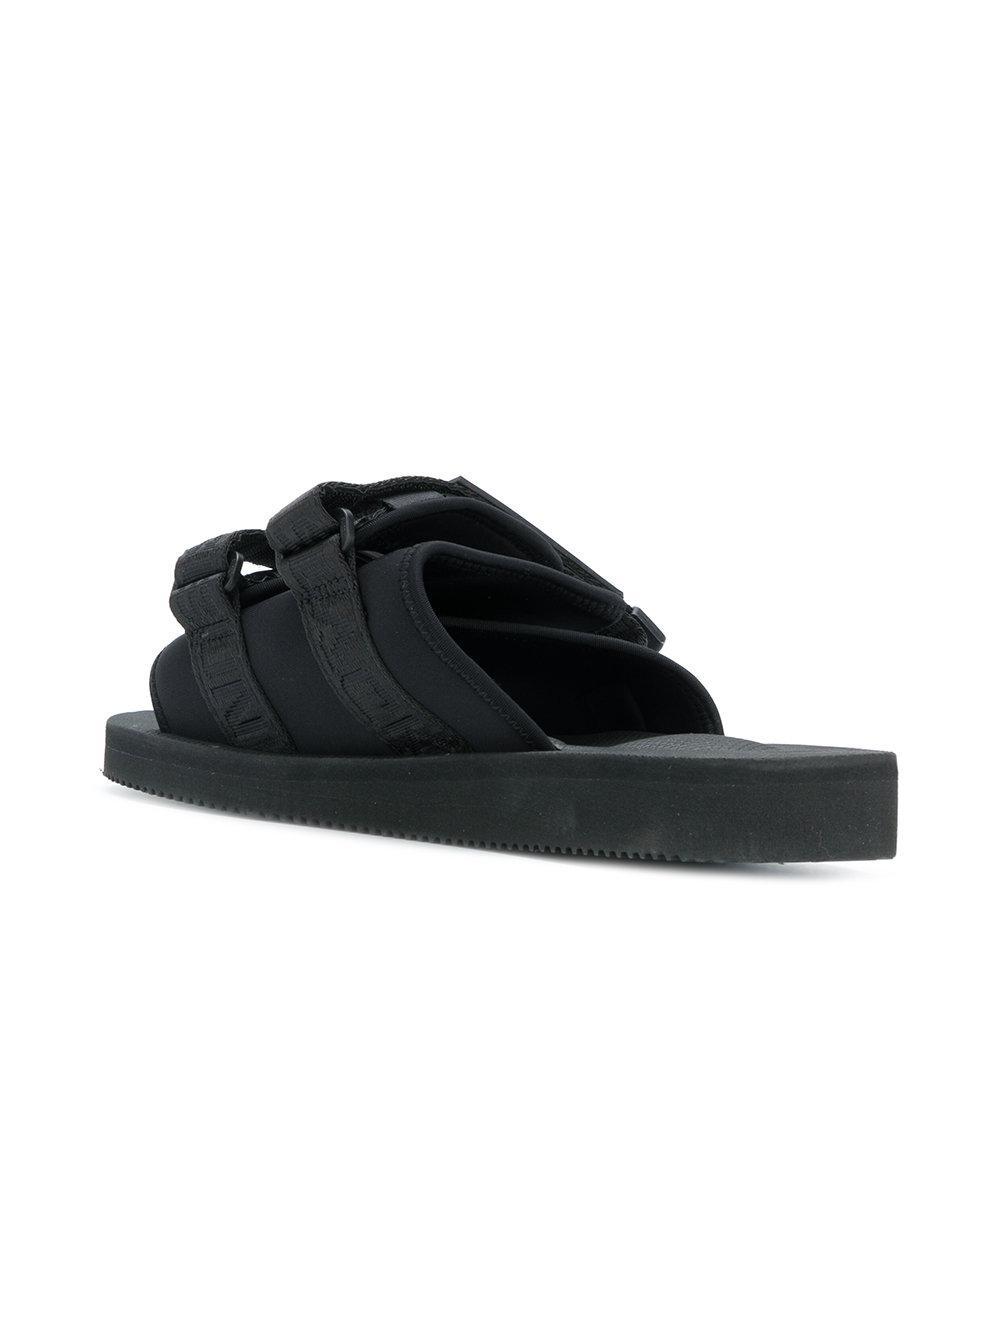 eb30b6f95850 Lyst - Palm Angels Suicoke Slides in Black for Men